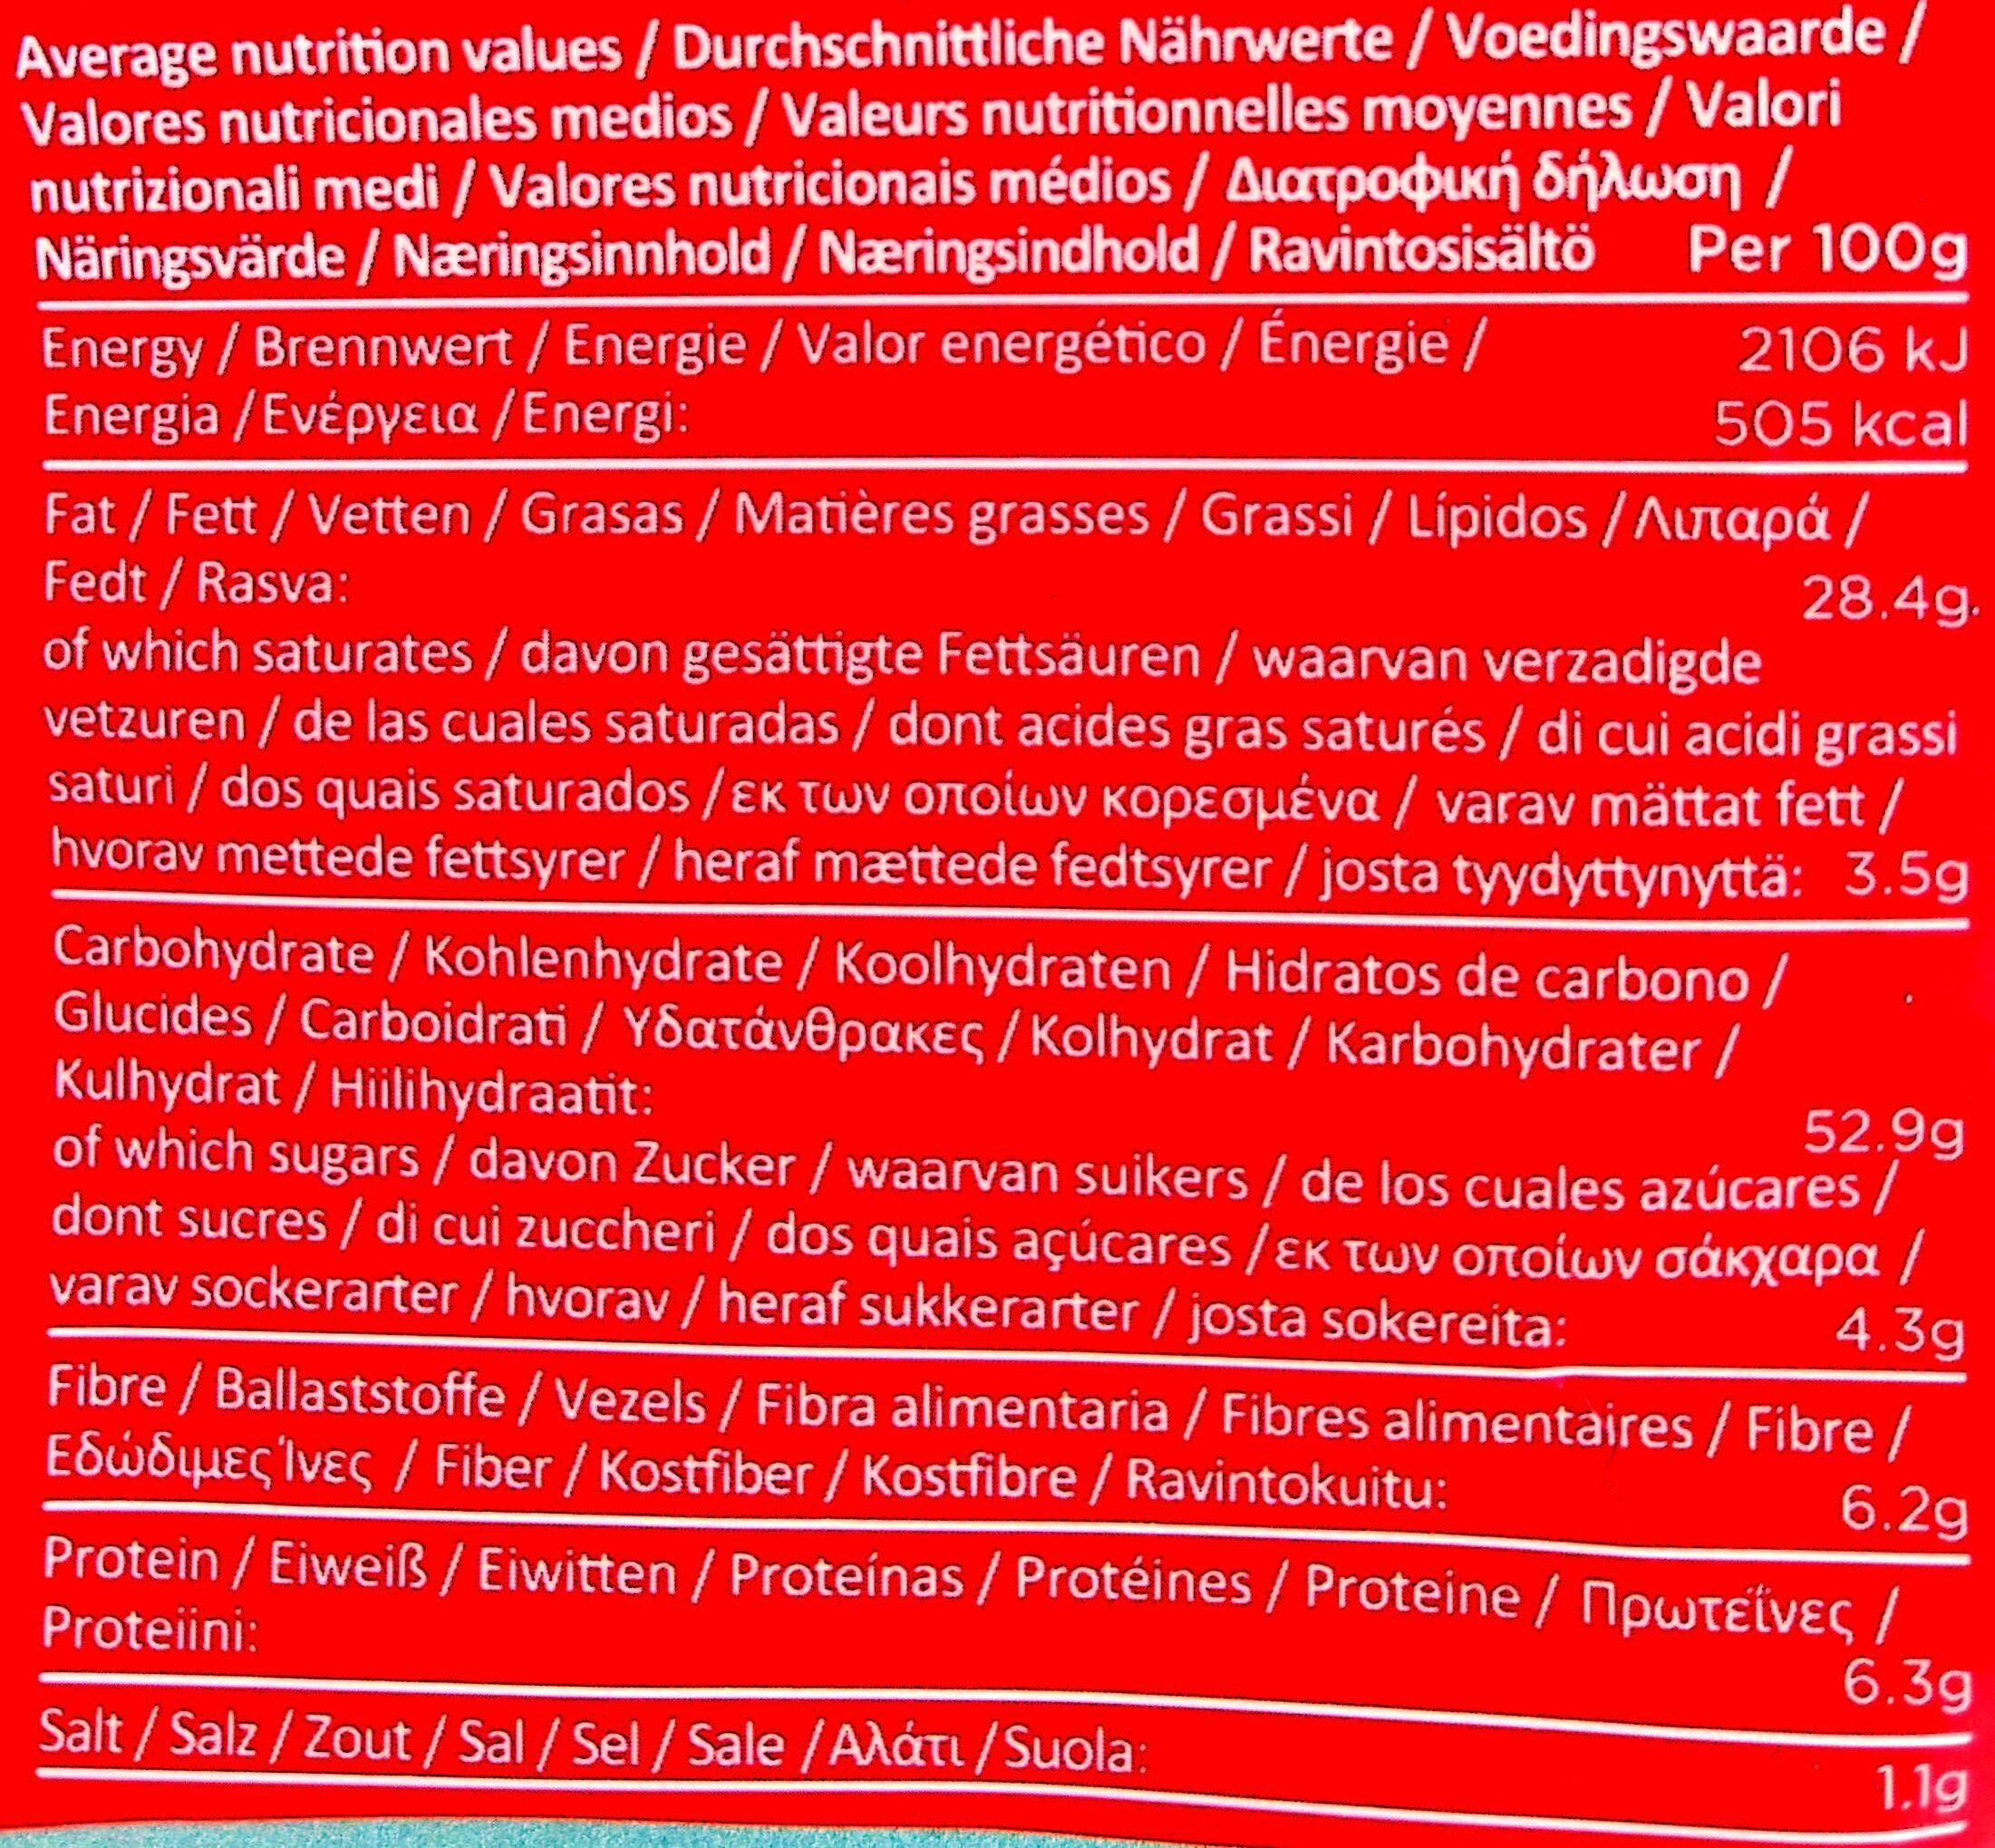 Patatas fritas Sweet Chili & Sour cream bolsa 150 g - Nutrition facts - fr